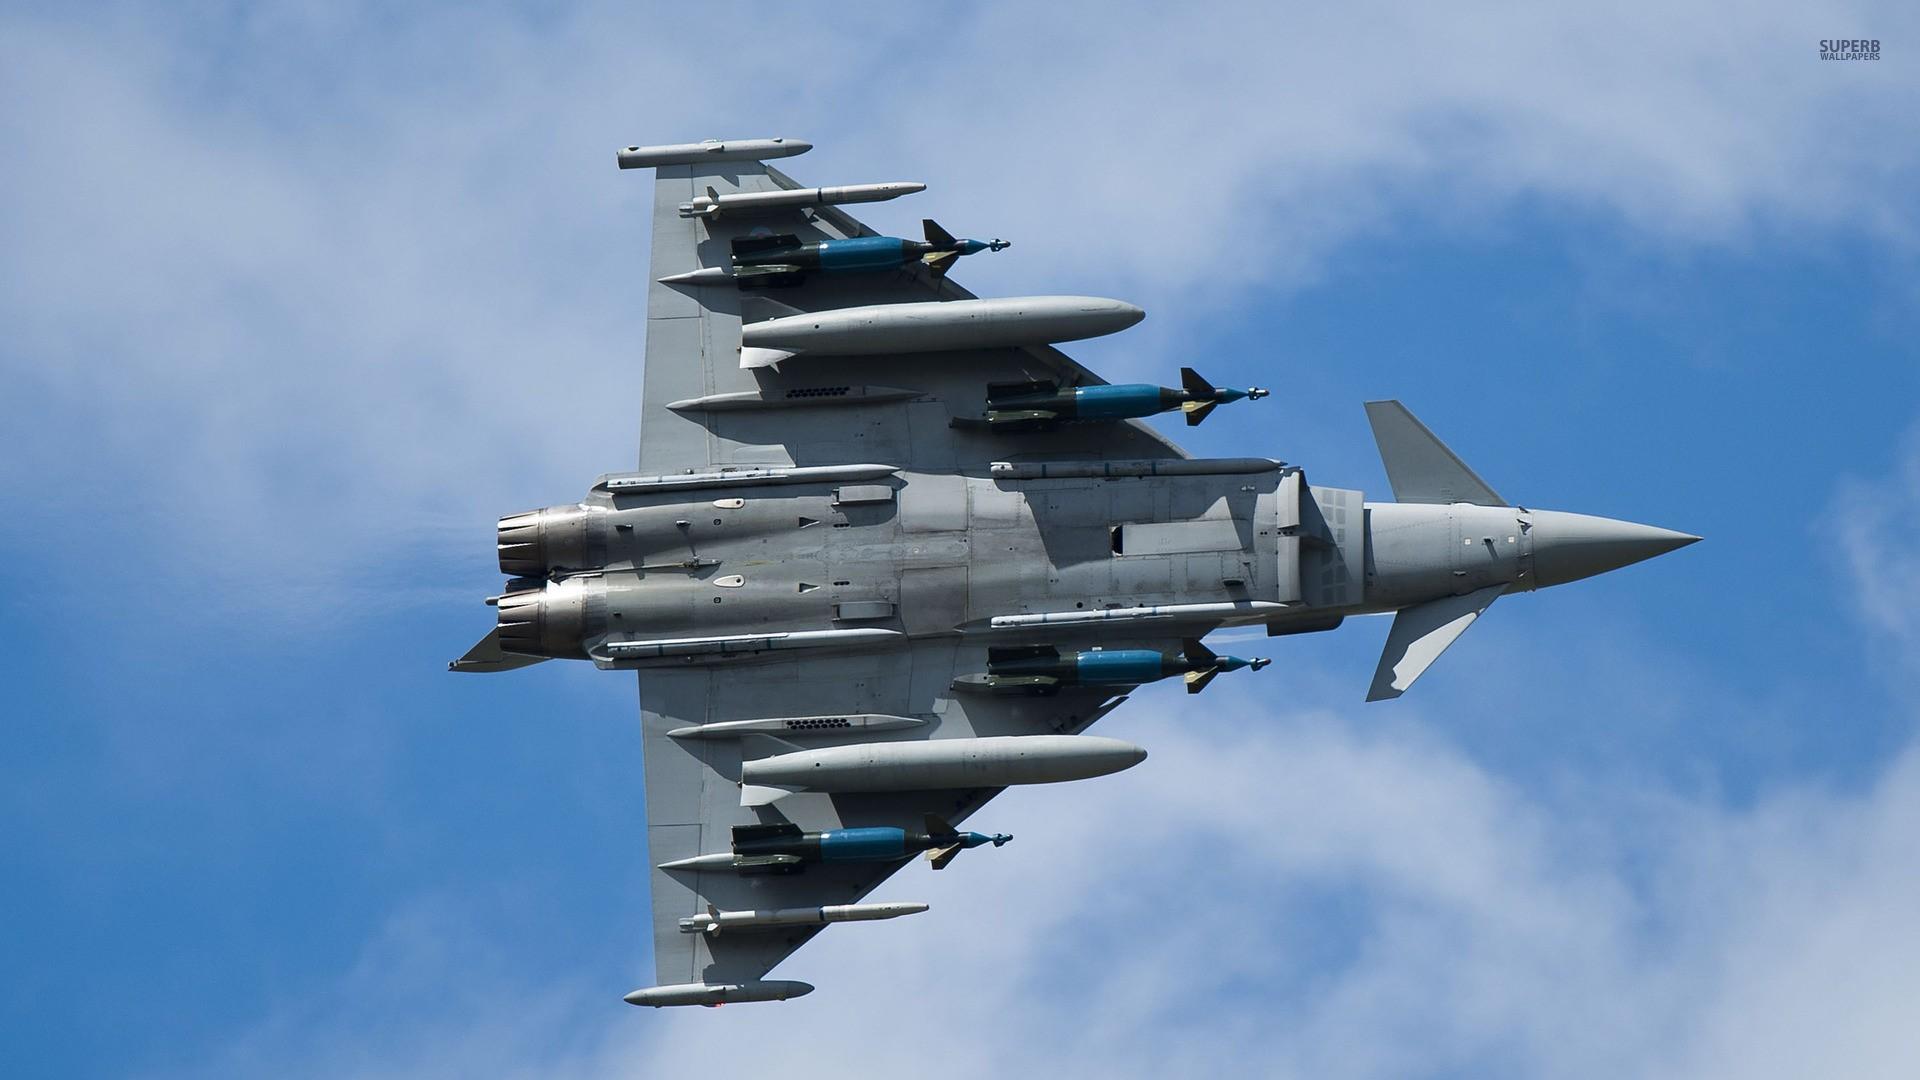 wallpaper : vehicle, airplane, eurofighter typhoon, military